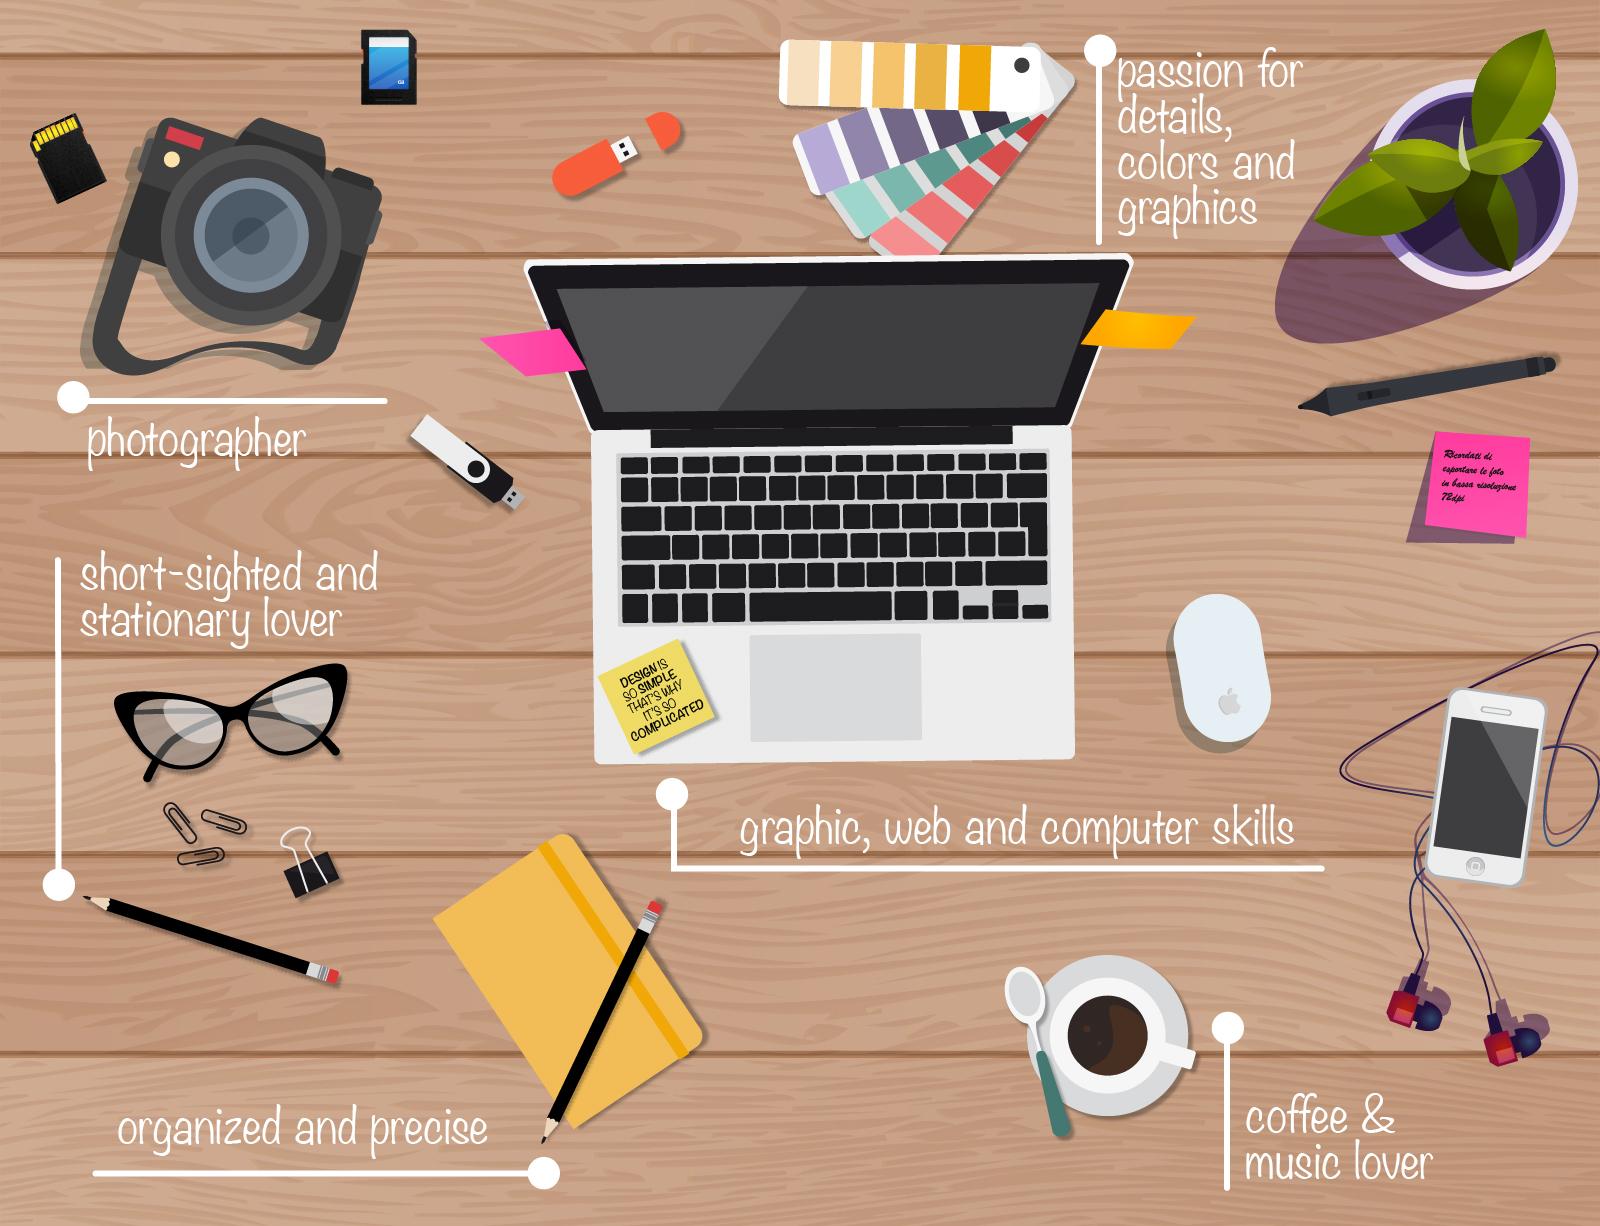 my-desk-photo-graphic-design+description